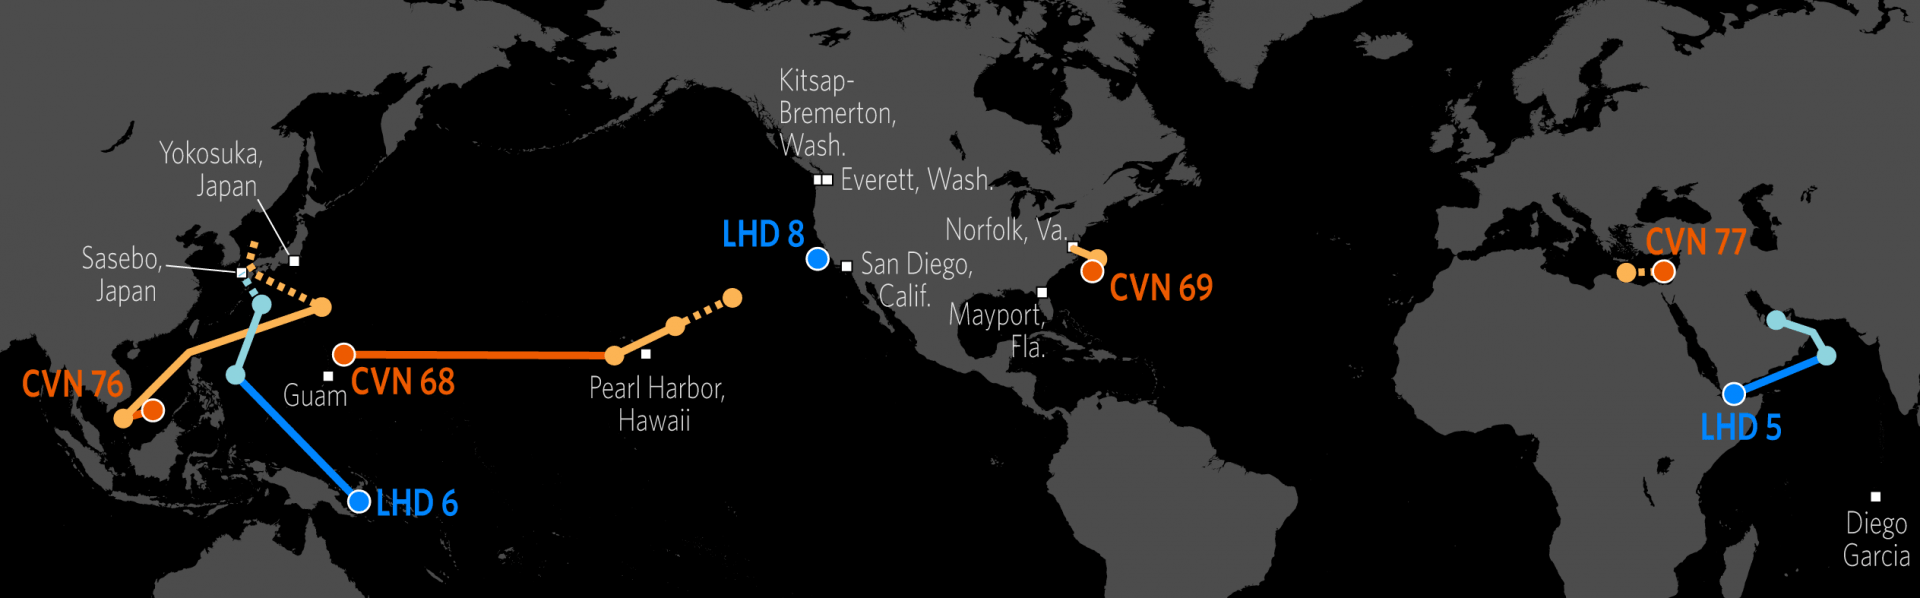 US Naval Update Map June 29 2017 Stratfor Worldview